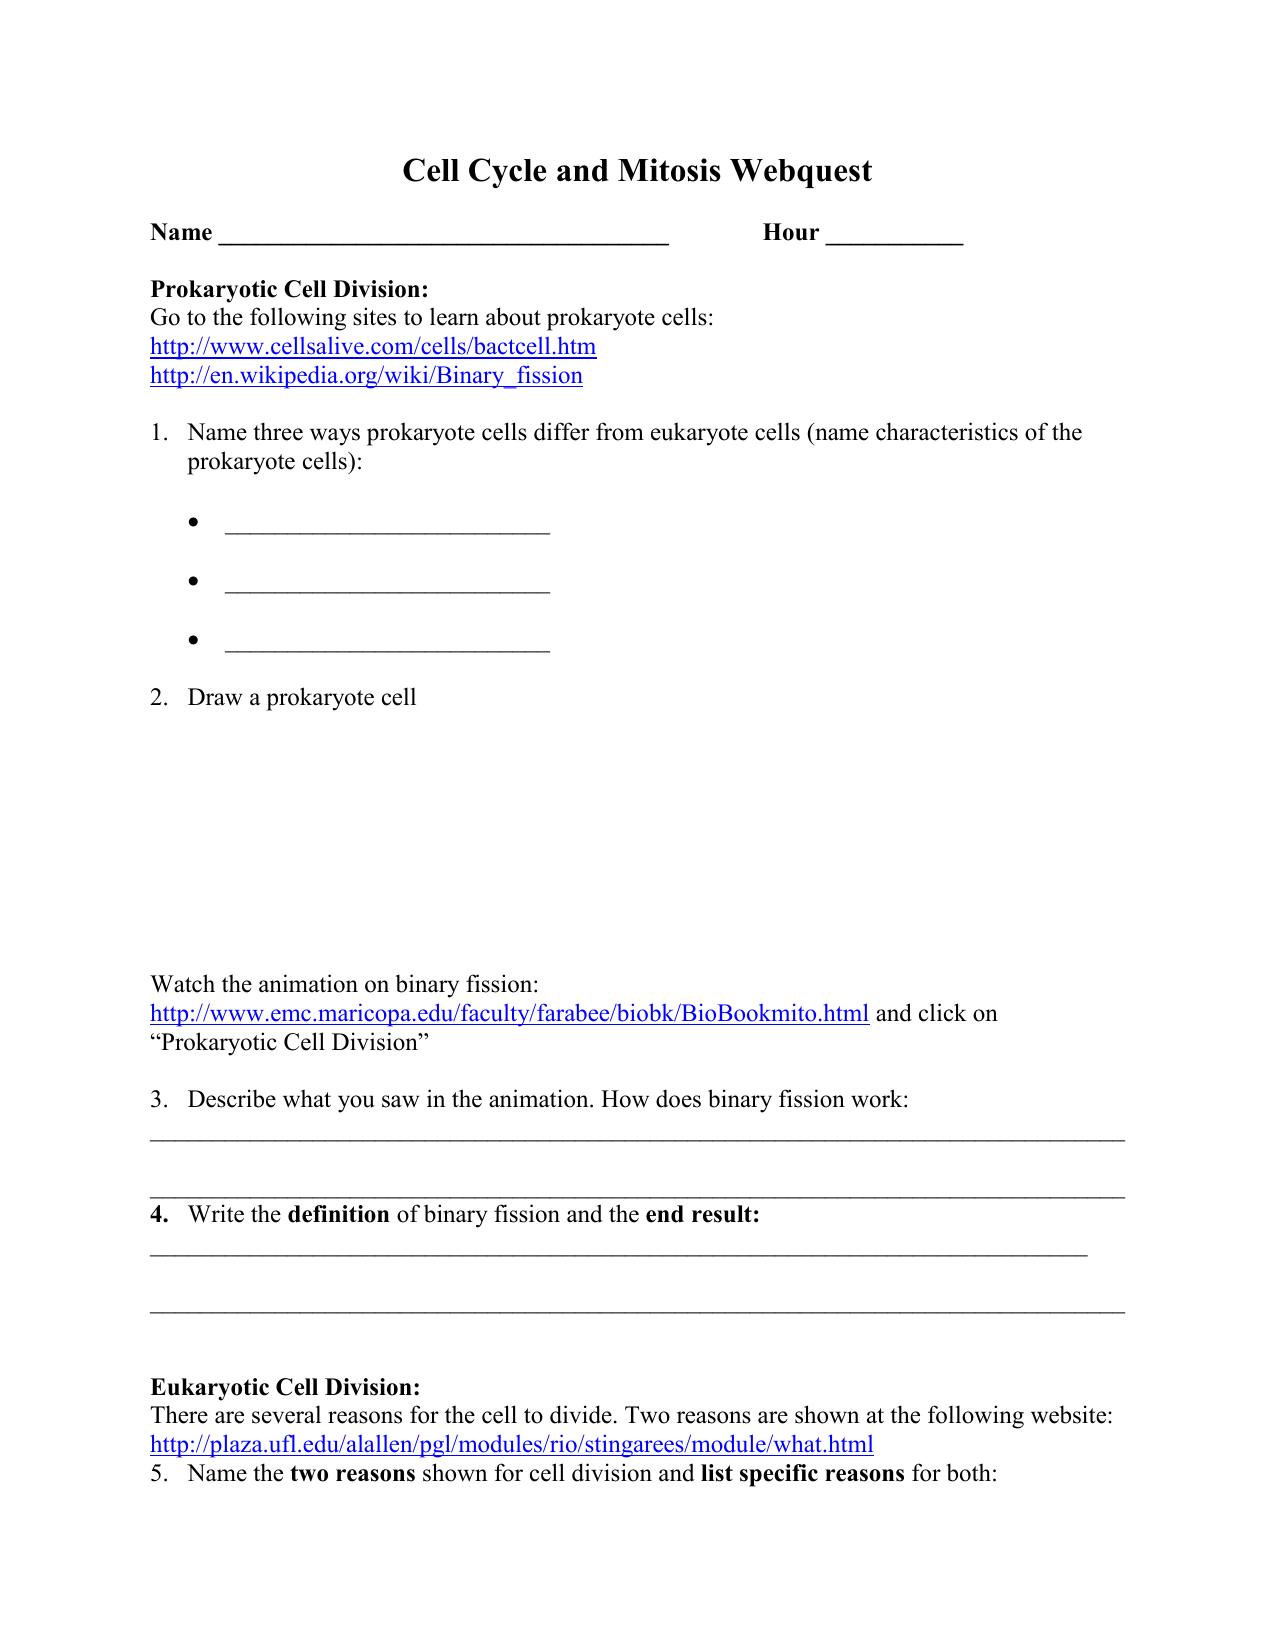 worksheet Binary Fission Worksheet 008509875 1 ae17390ab8cf809f2e18a0bf18464d68 png